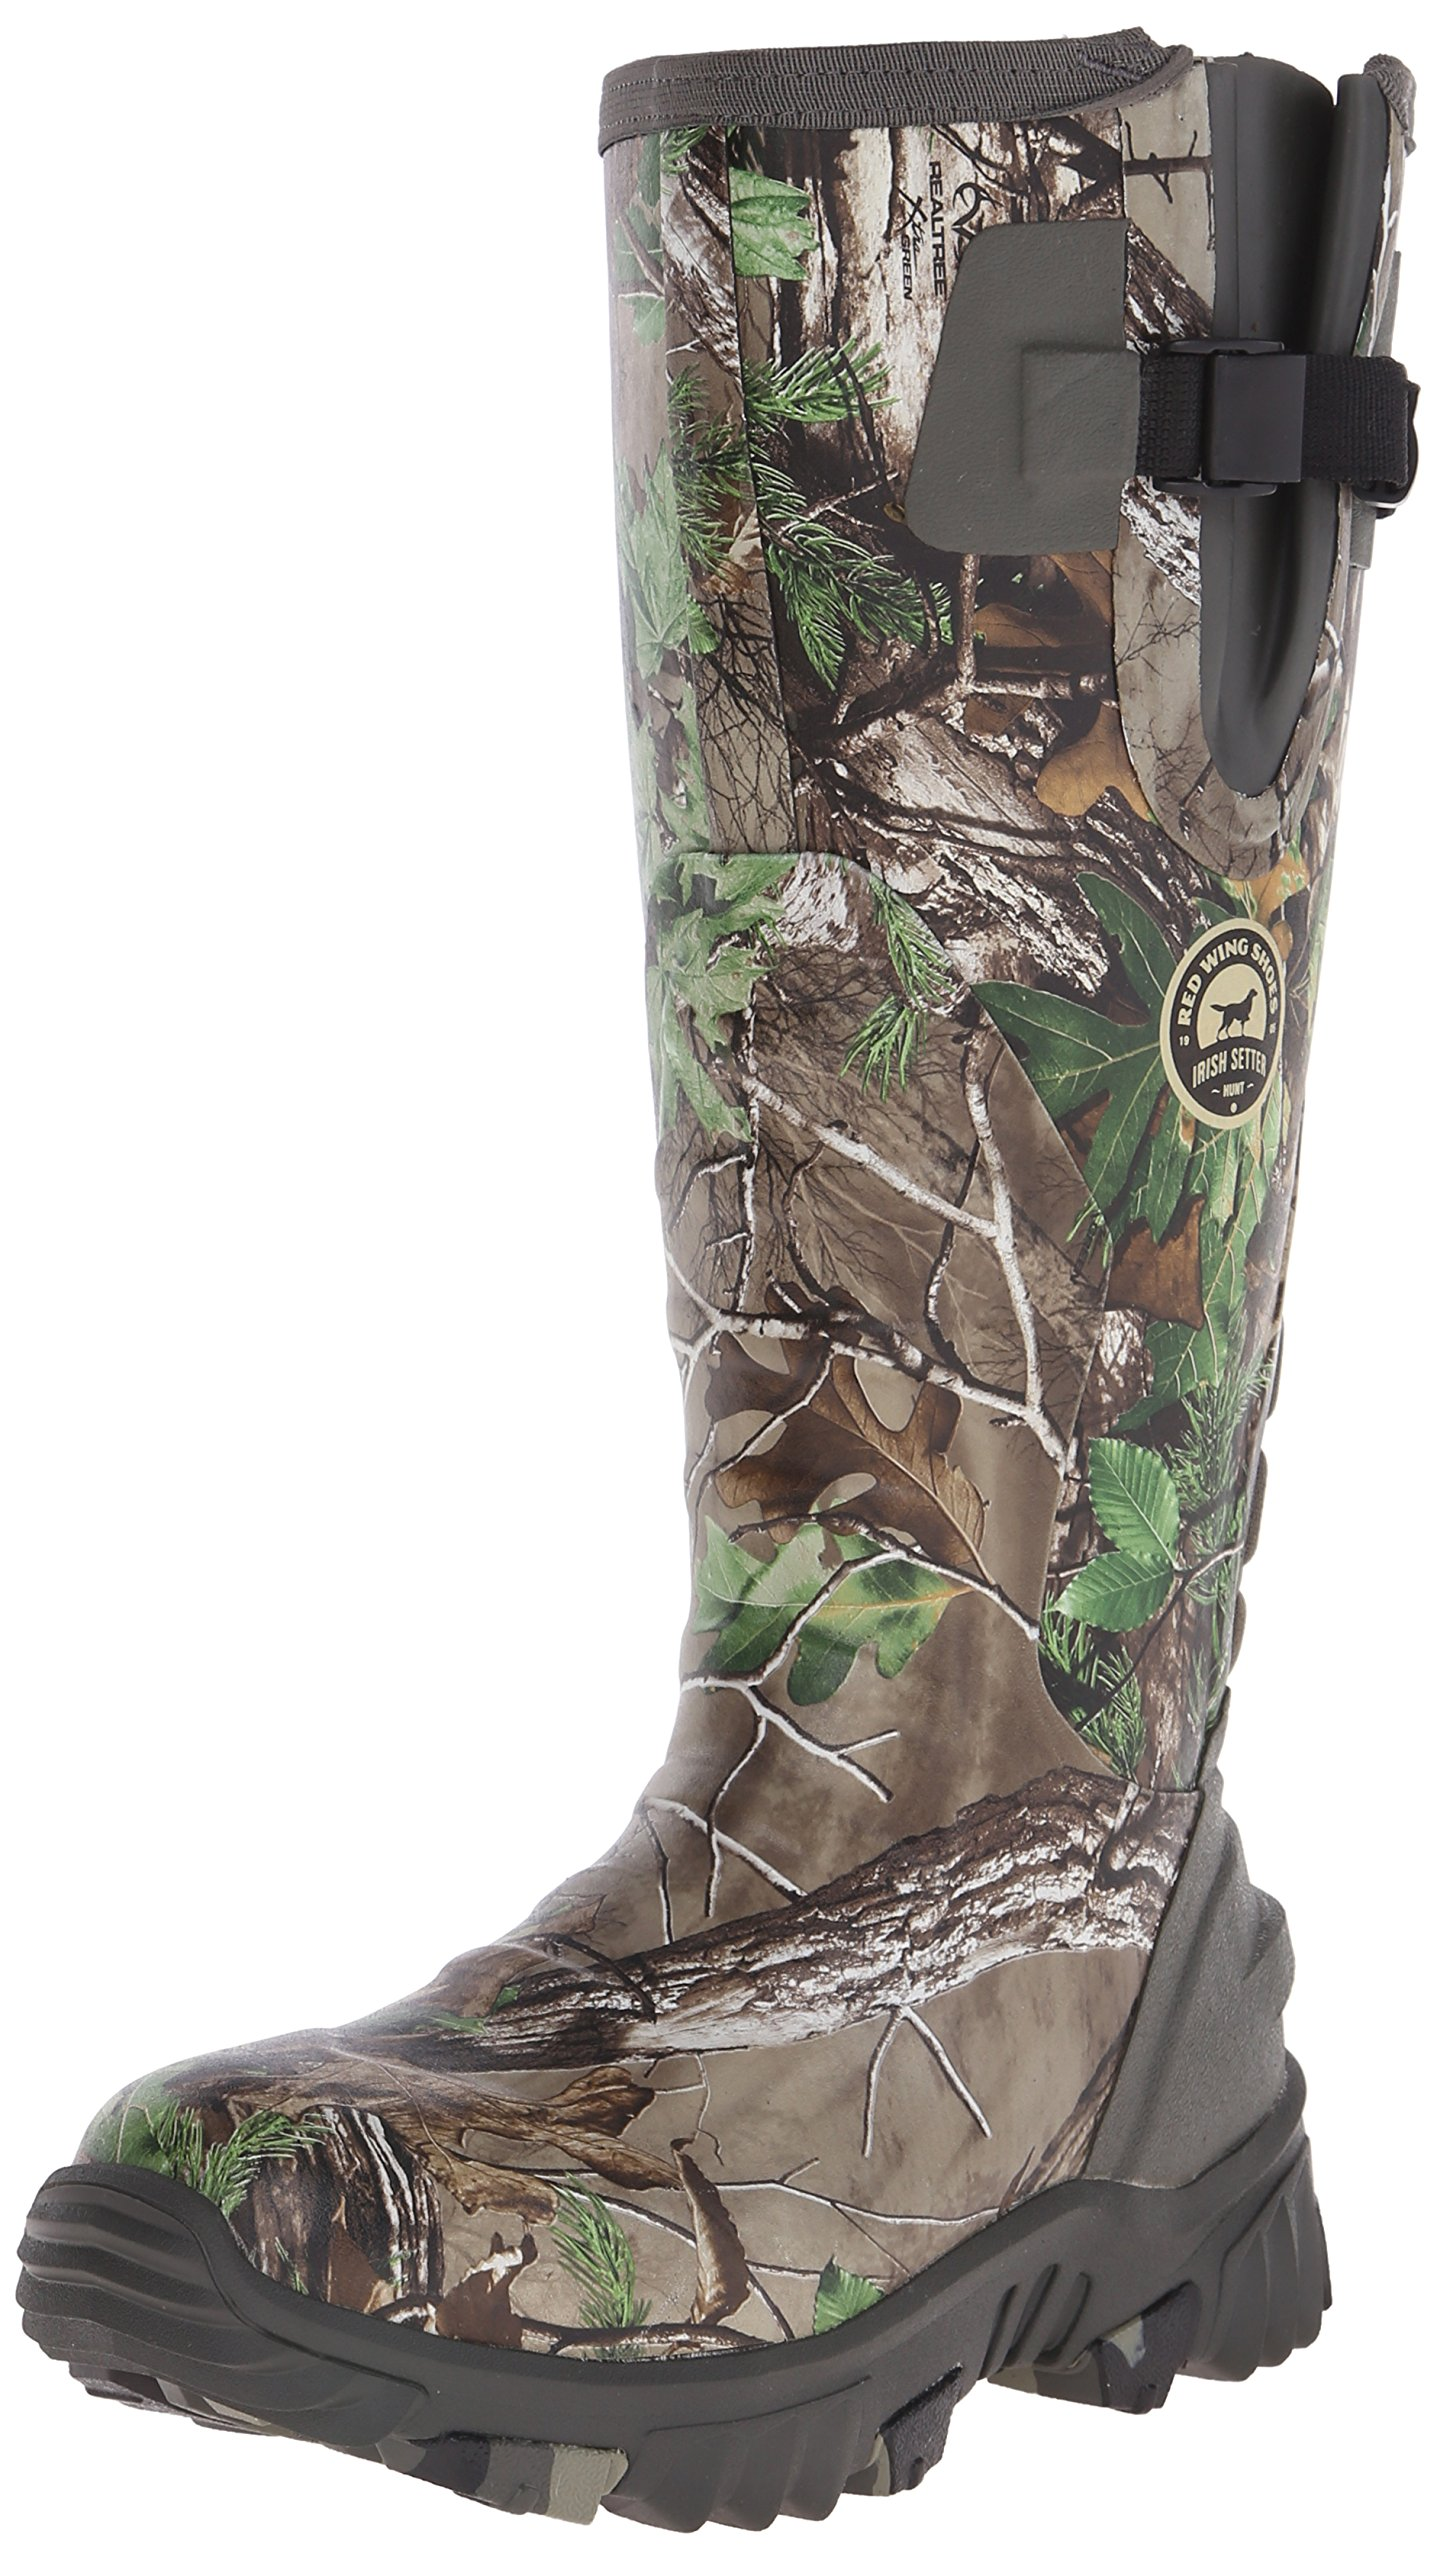 Irish Setter Women's 4885 Rutmaster 2.0 15'' Uninsulated Rubber Hunting Boot, Real Tree Camo, 8 E US by Irish Setter